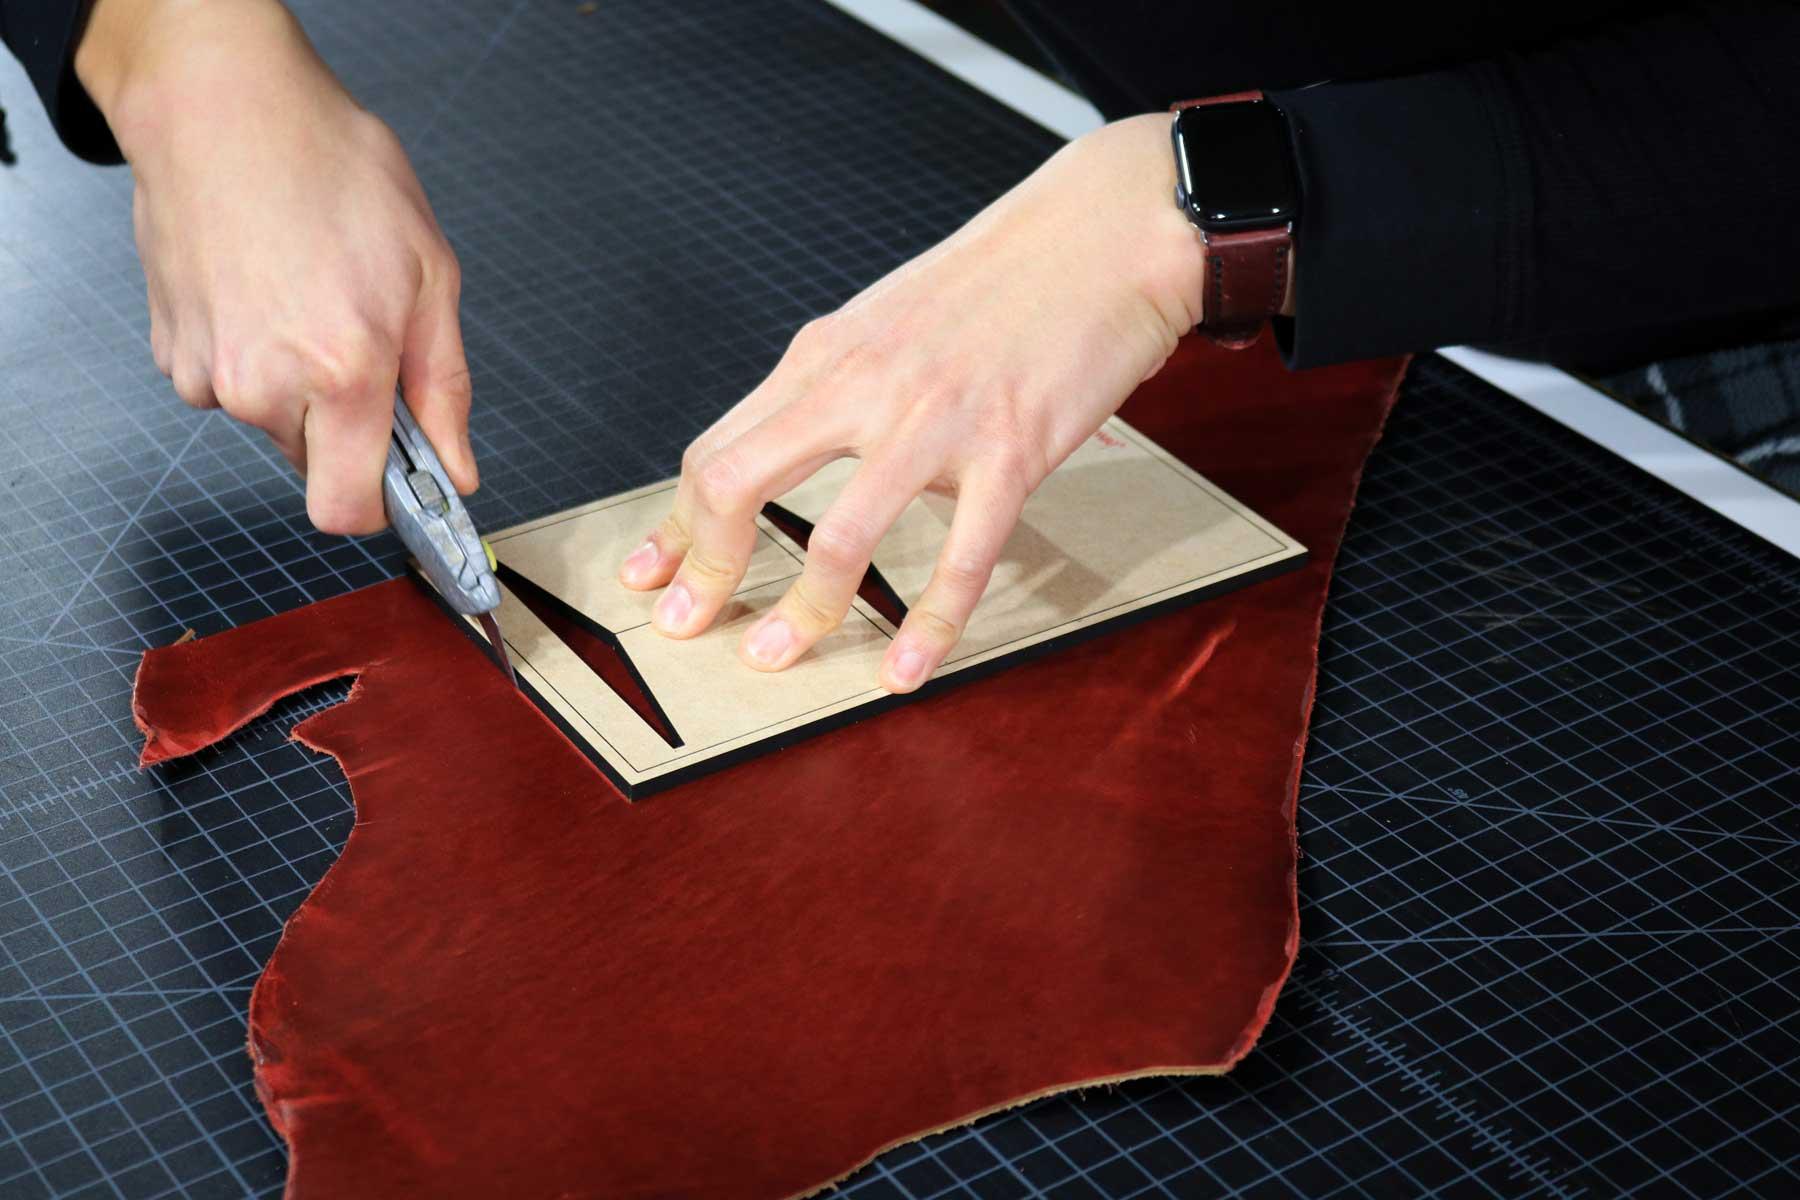 Cutting inner pocket